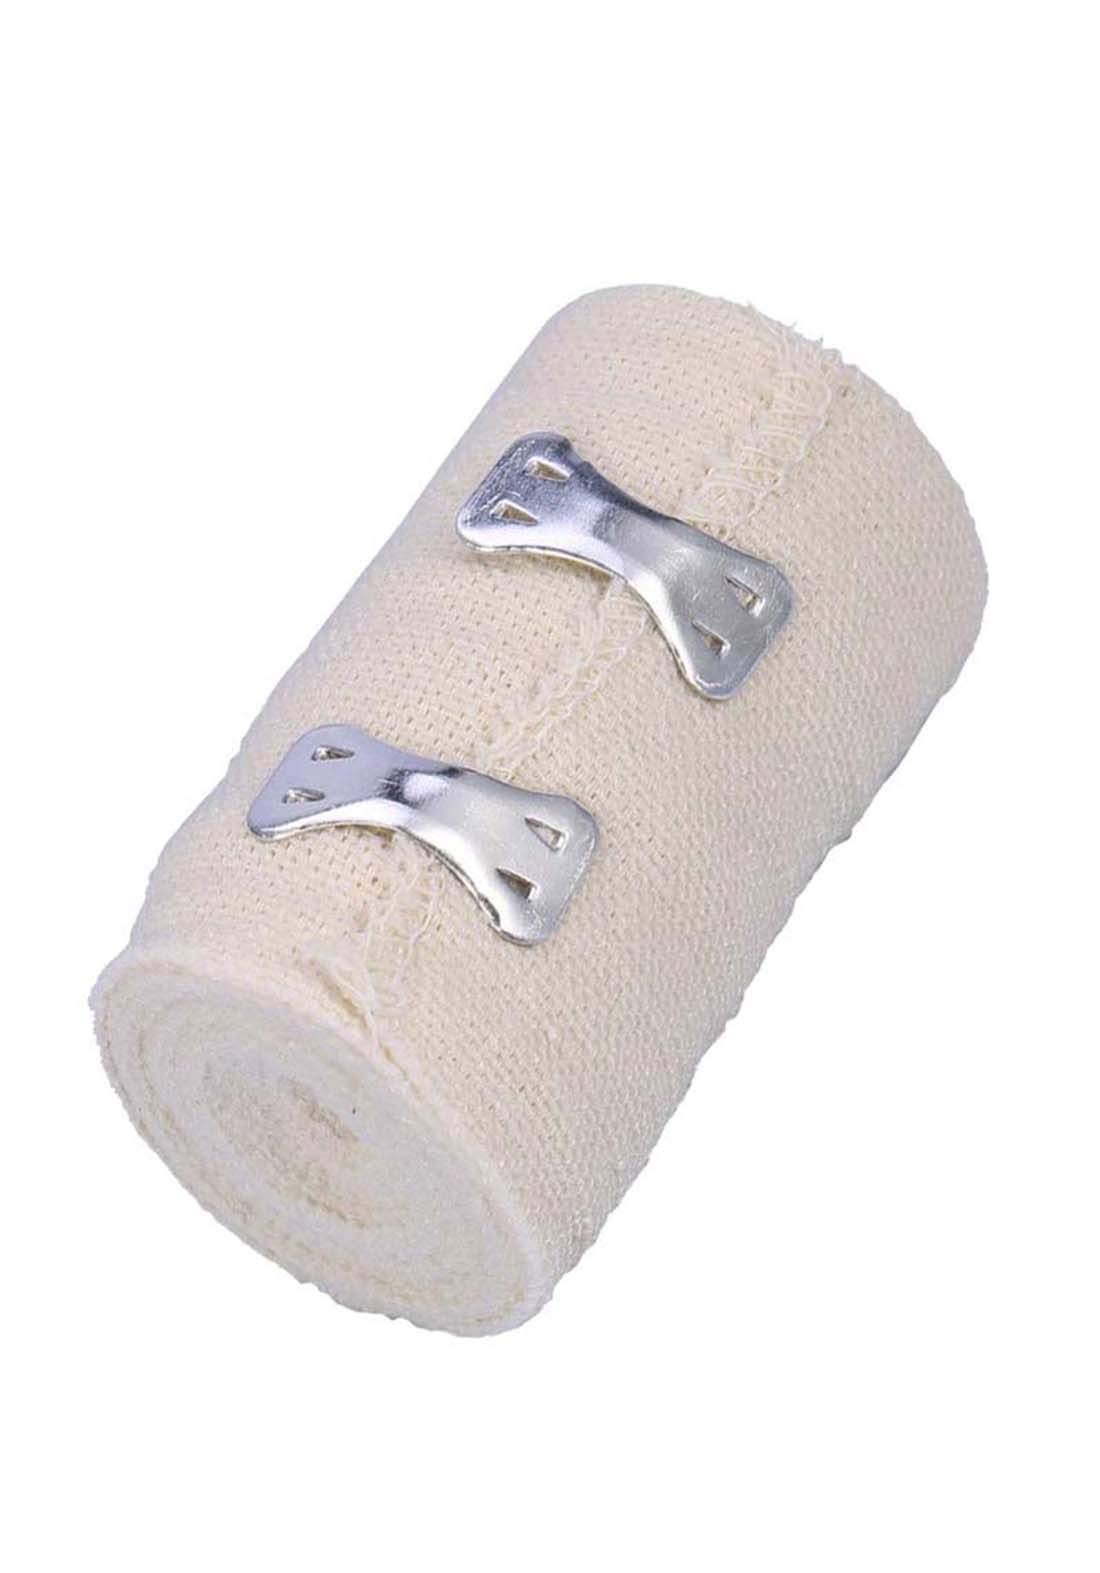 Optimal medical elastic bandages with clips 10cm*4m  ضمادات طبية مطاطة بمشبك معدني